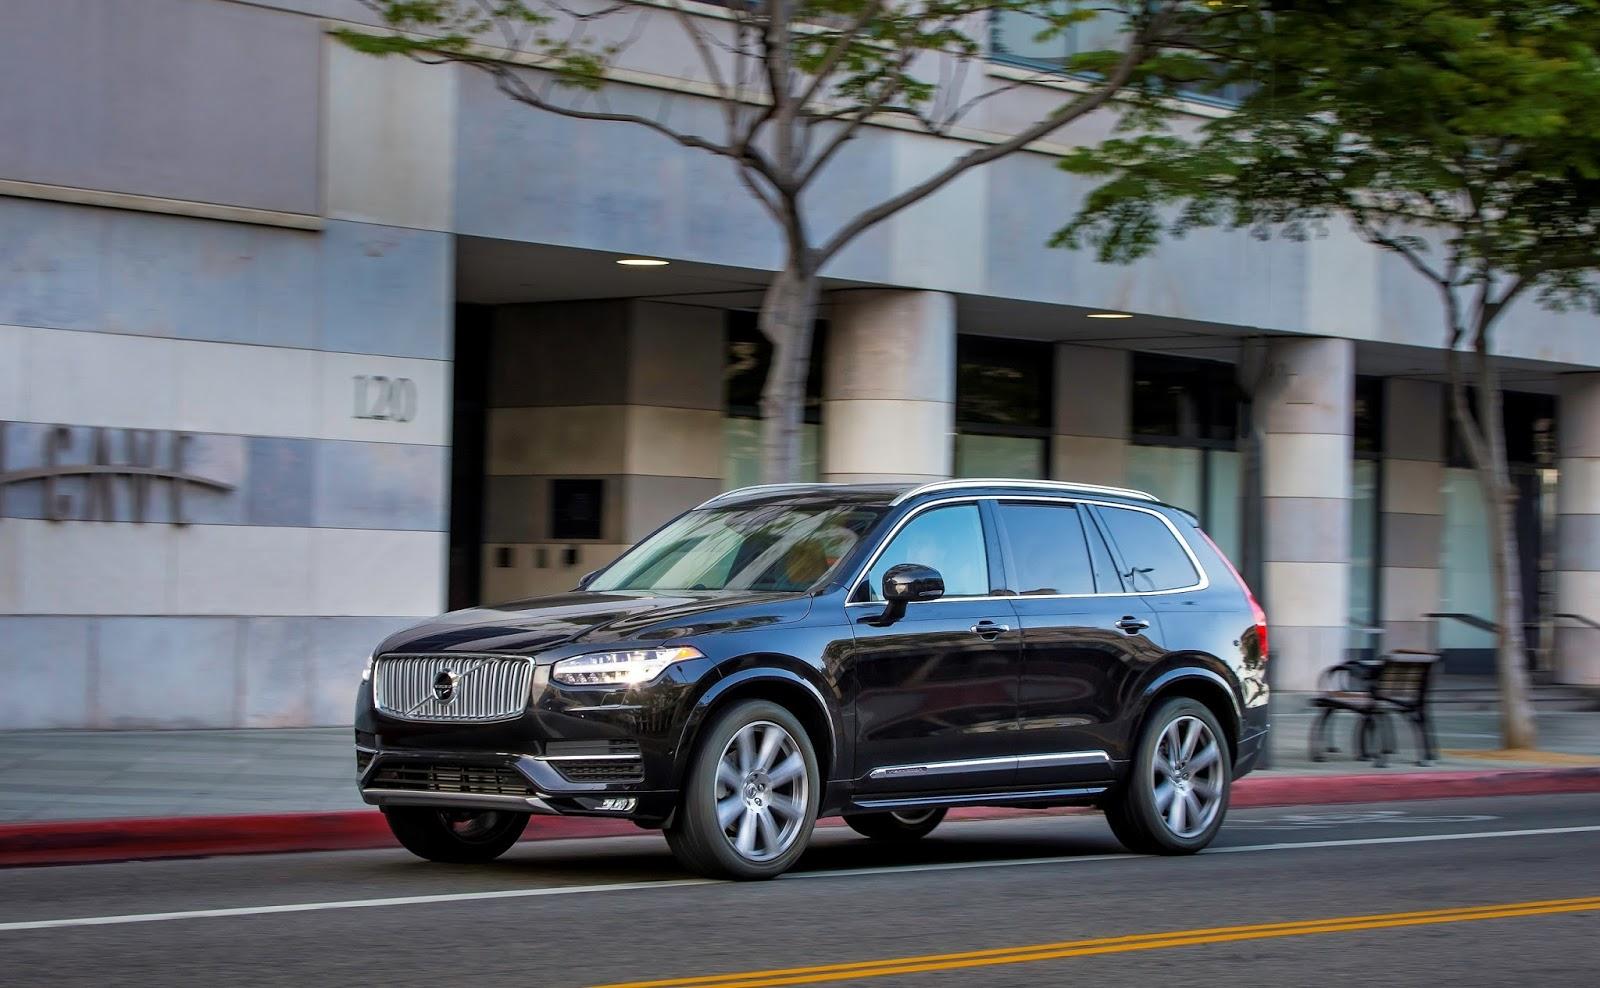 VOLVO2BXC902B252812529 Η Volvo αναμένει ρεκόρ πωλήσεων και το 2016 Sales, Volvo, αγορά, πωλήσεις